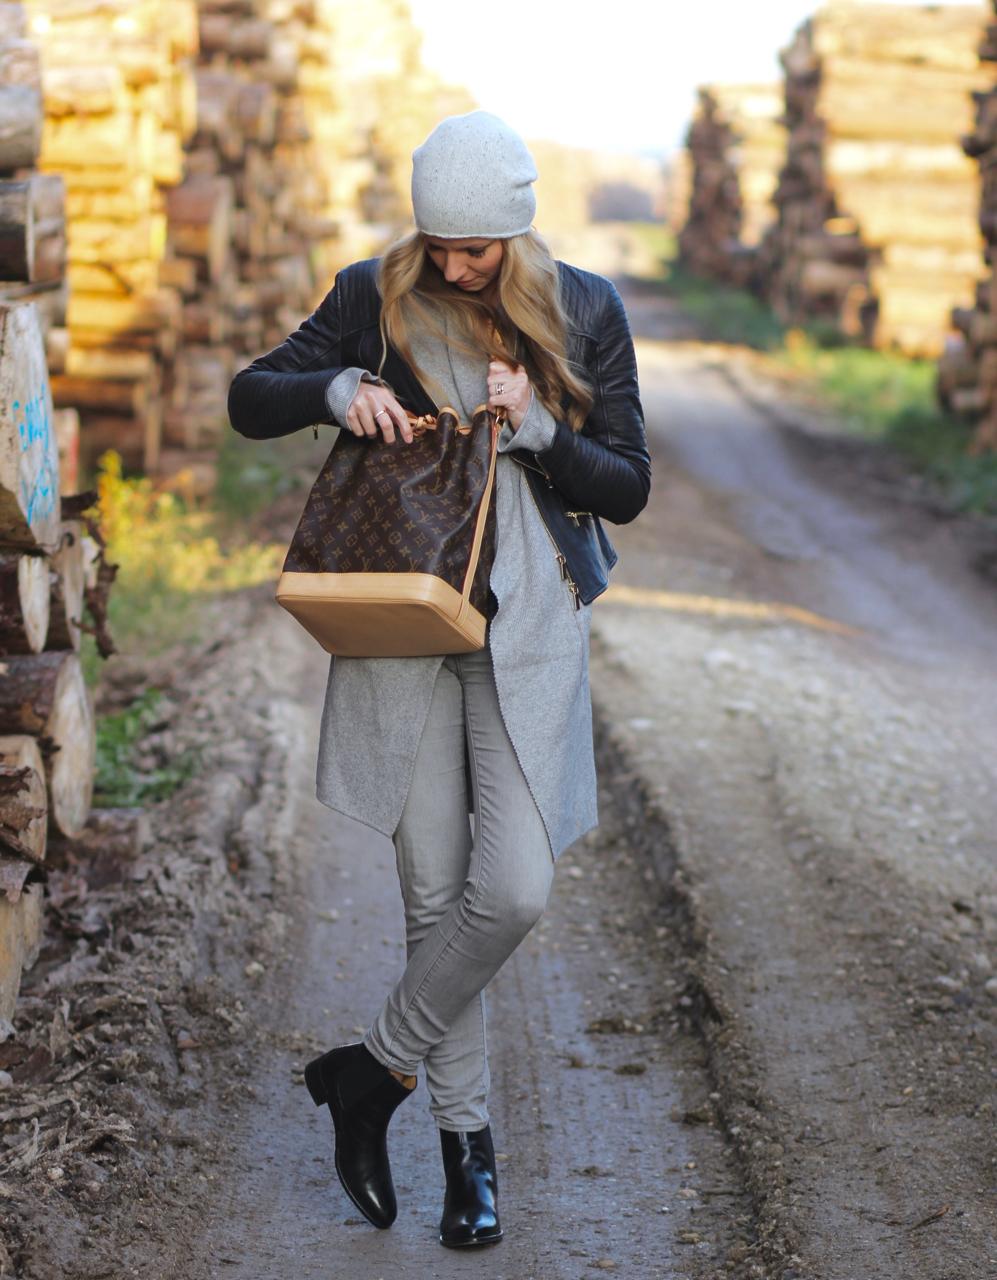 Herbstoutfit in Grau und Schwarz Melvin&Hamilton Schuhe Boots Outfit Herbst Fall Autumn COS LV LVOE LouisVuitton Vuitton Noé PetitNoé GrandeNoé Levi's Jeans Casual Denim Wool CamisoleTop Zara Fashion Mode PepperAndGold Jennifer FrauHuegelWürzburg